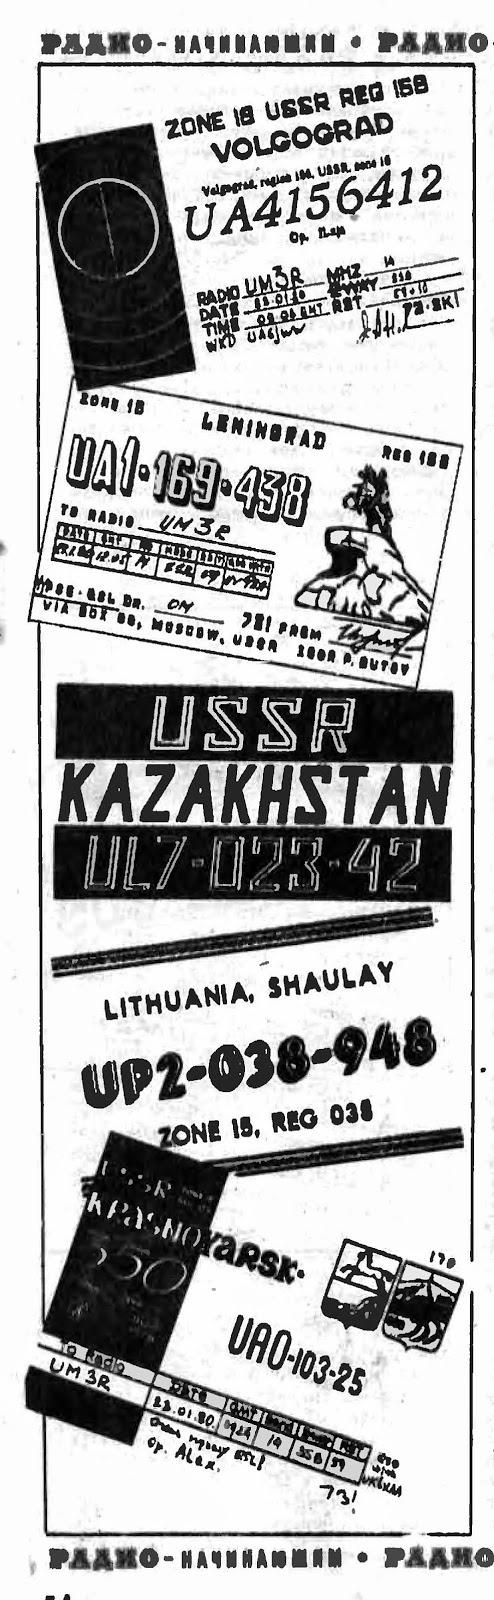 UVB-76 The Buzzer the ZhUOZ Report 2016 | Shortwave Radio World